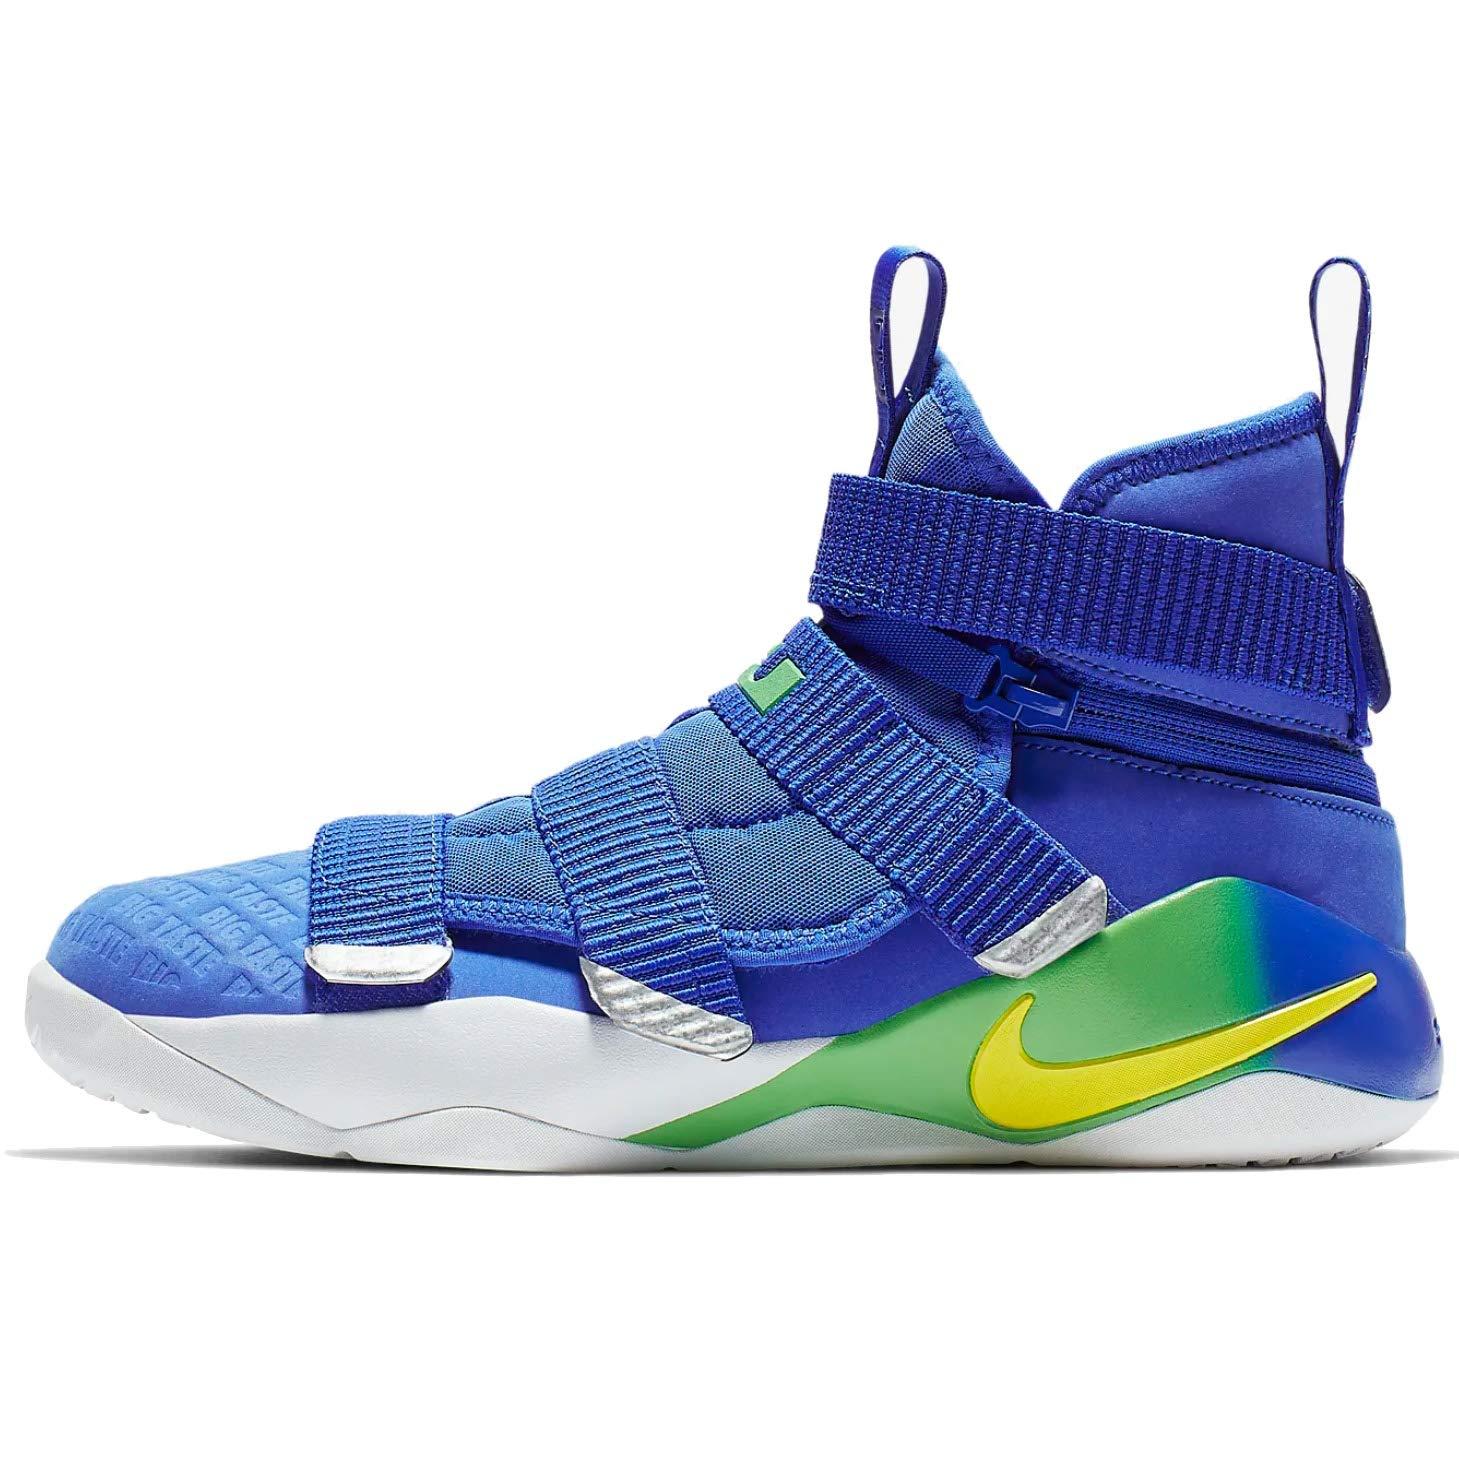 best service ec81f d723a Amazon.com   Nike Lebron Soldier Xi Flyease (gs) Big Kids ...